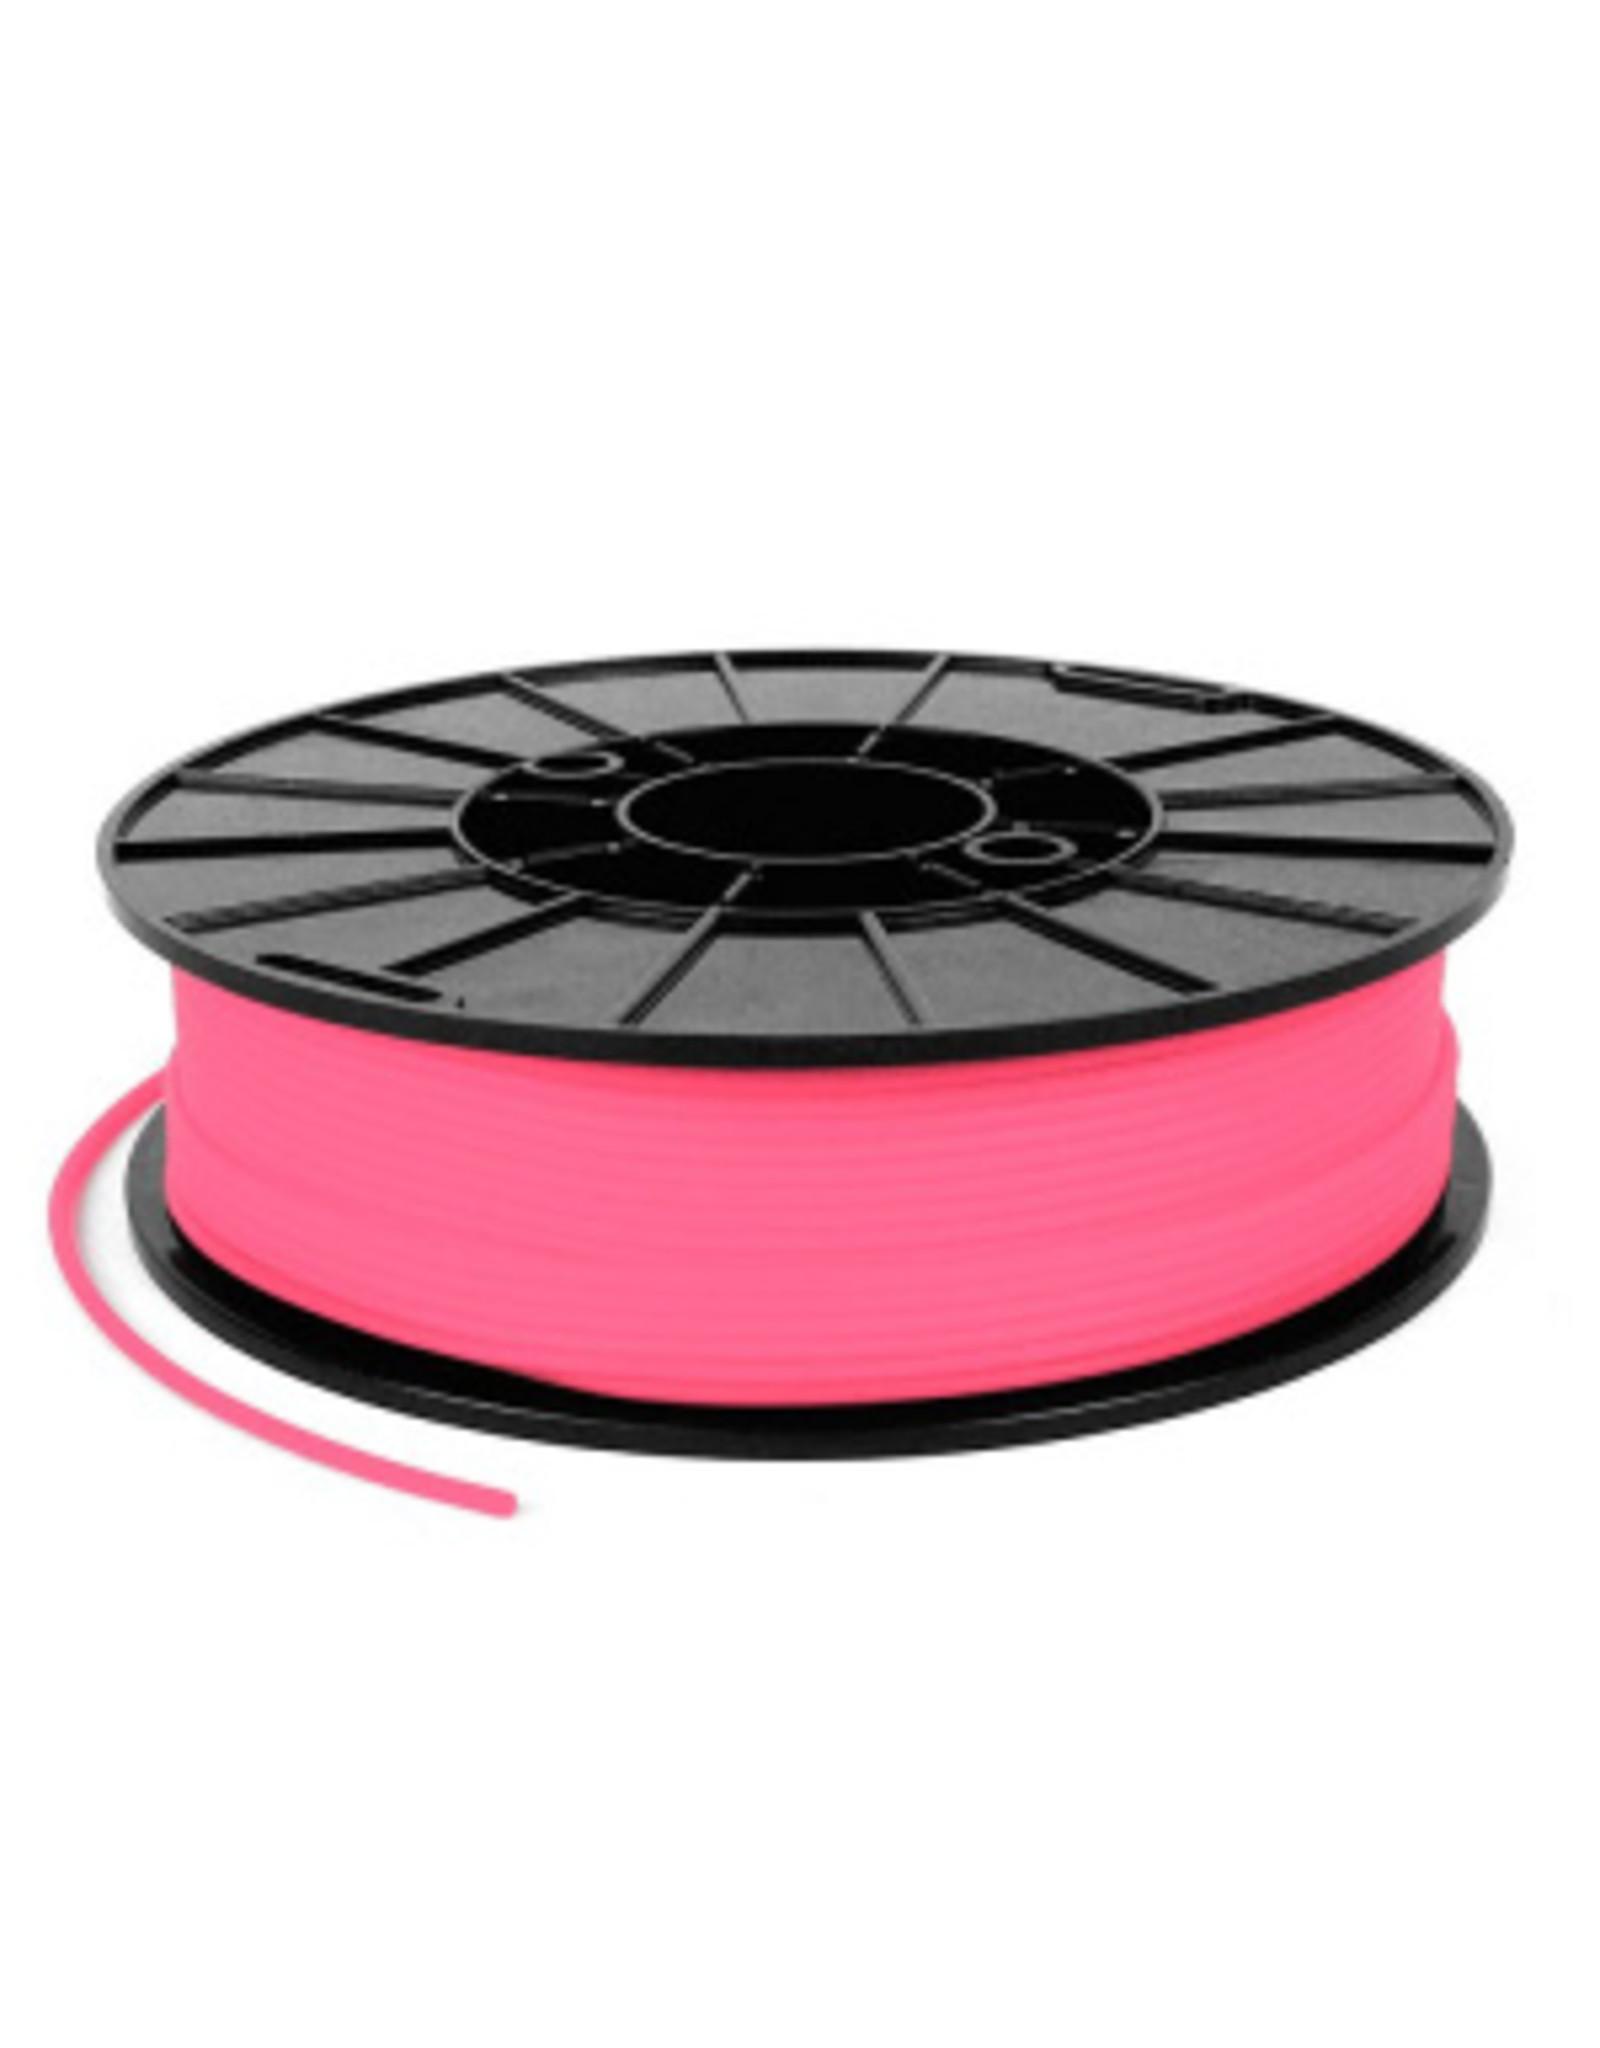 Ninja NinjaFlex Filament - 1.75mm - 0.5 kg - Flamingo roze